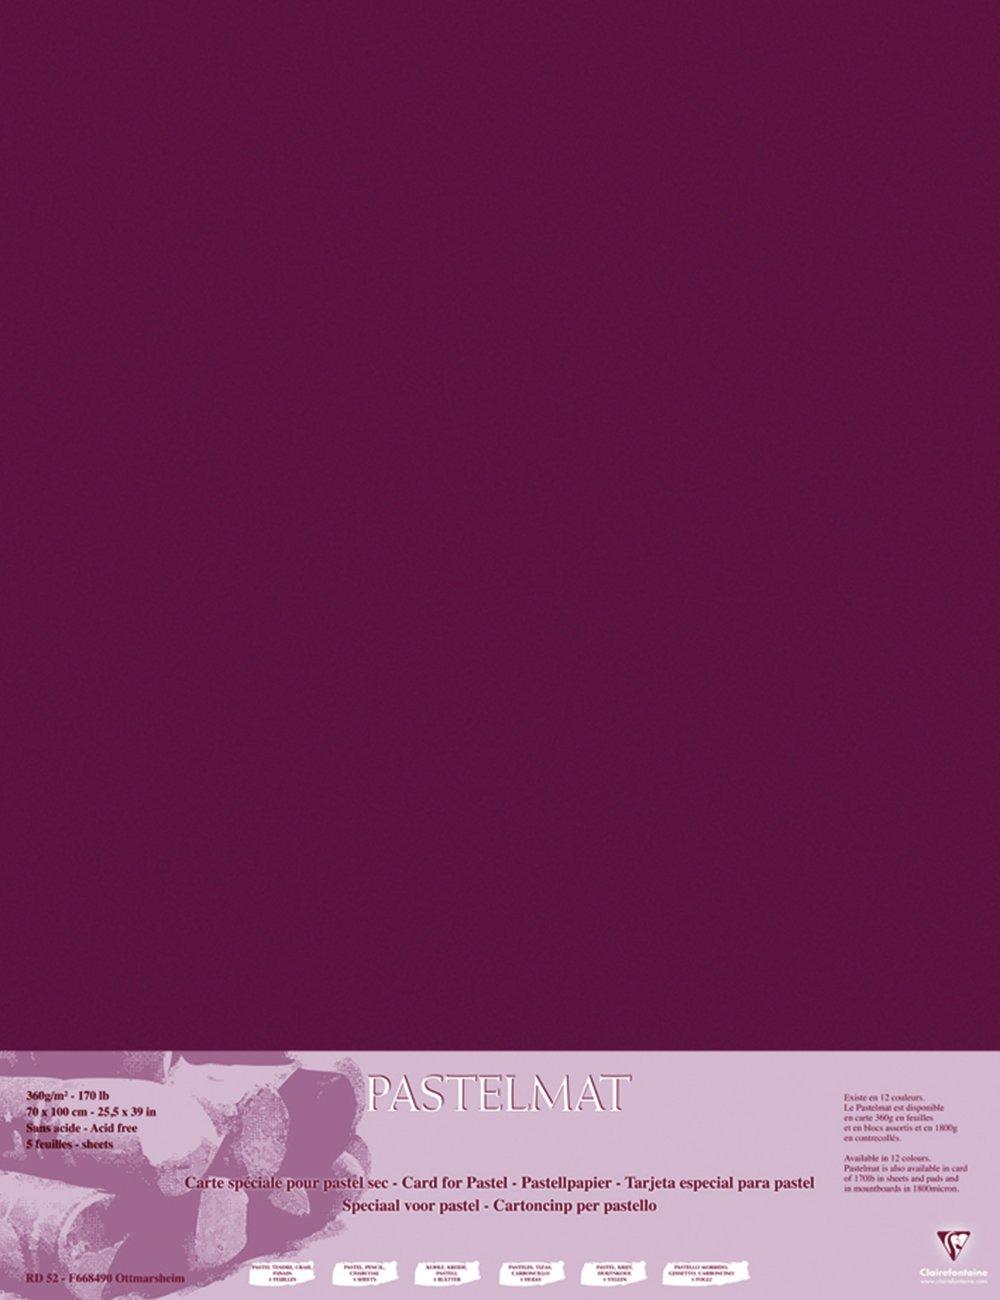 Clairefontaine 96163C Confezione Pastelmat, 70 x 100 cm, 5 Fogli, Vino